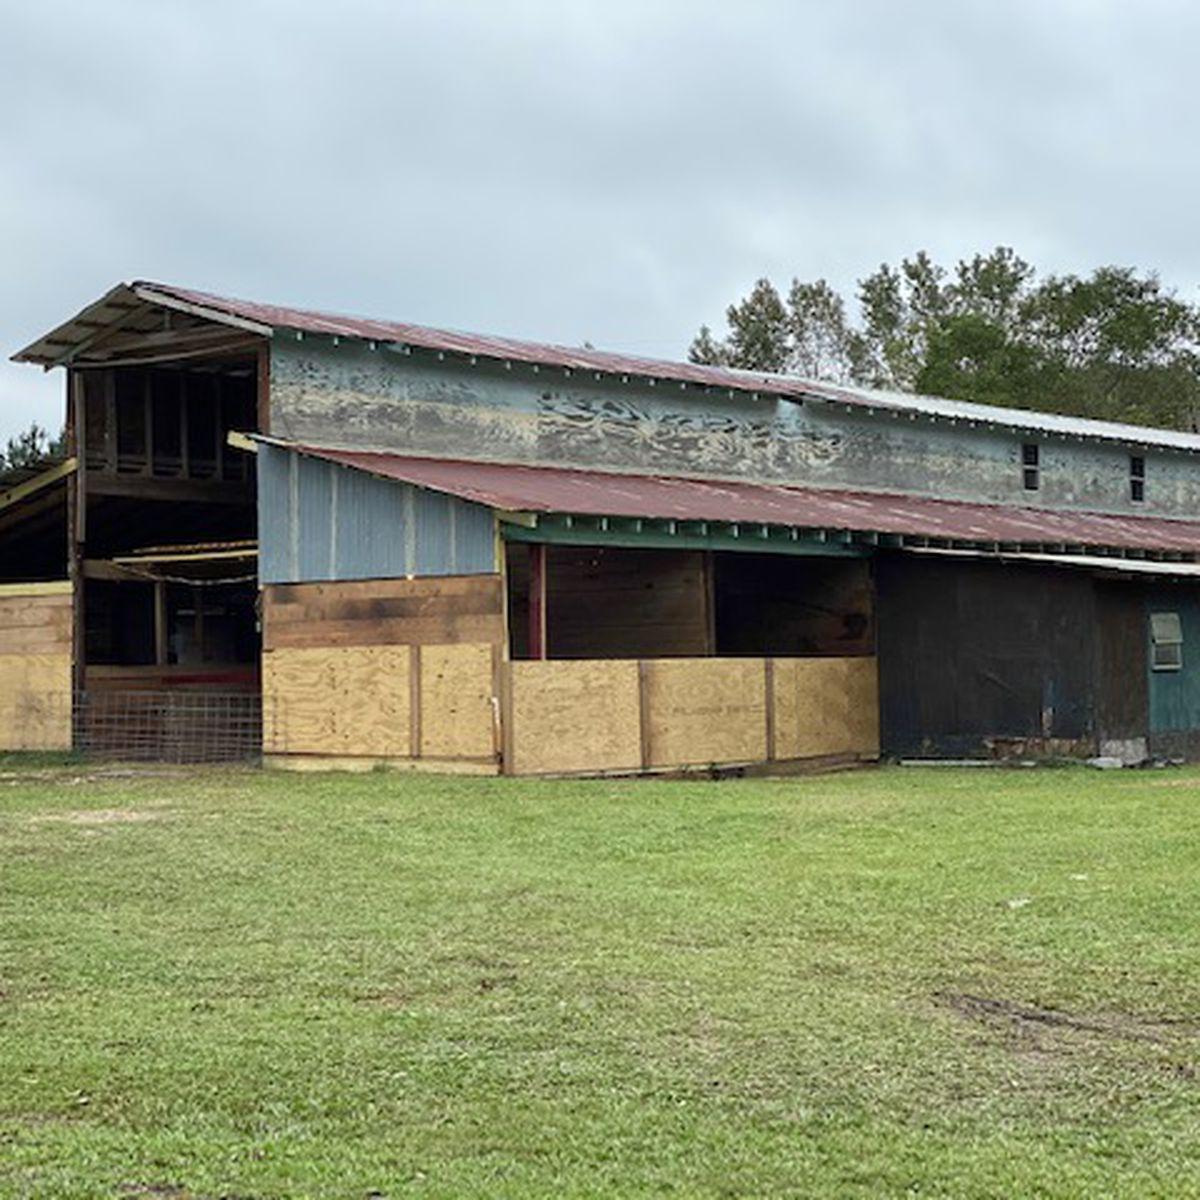 Gr8 Neighbor opens doors for students' farm animals